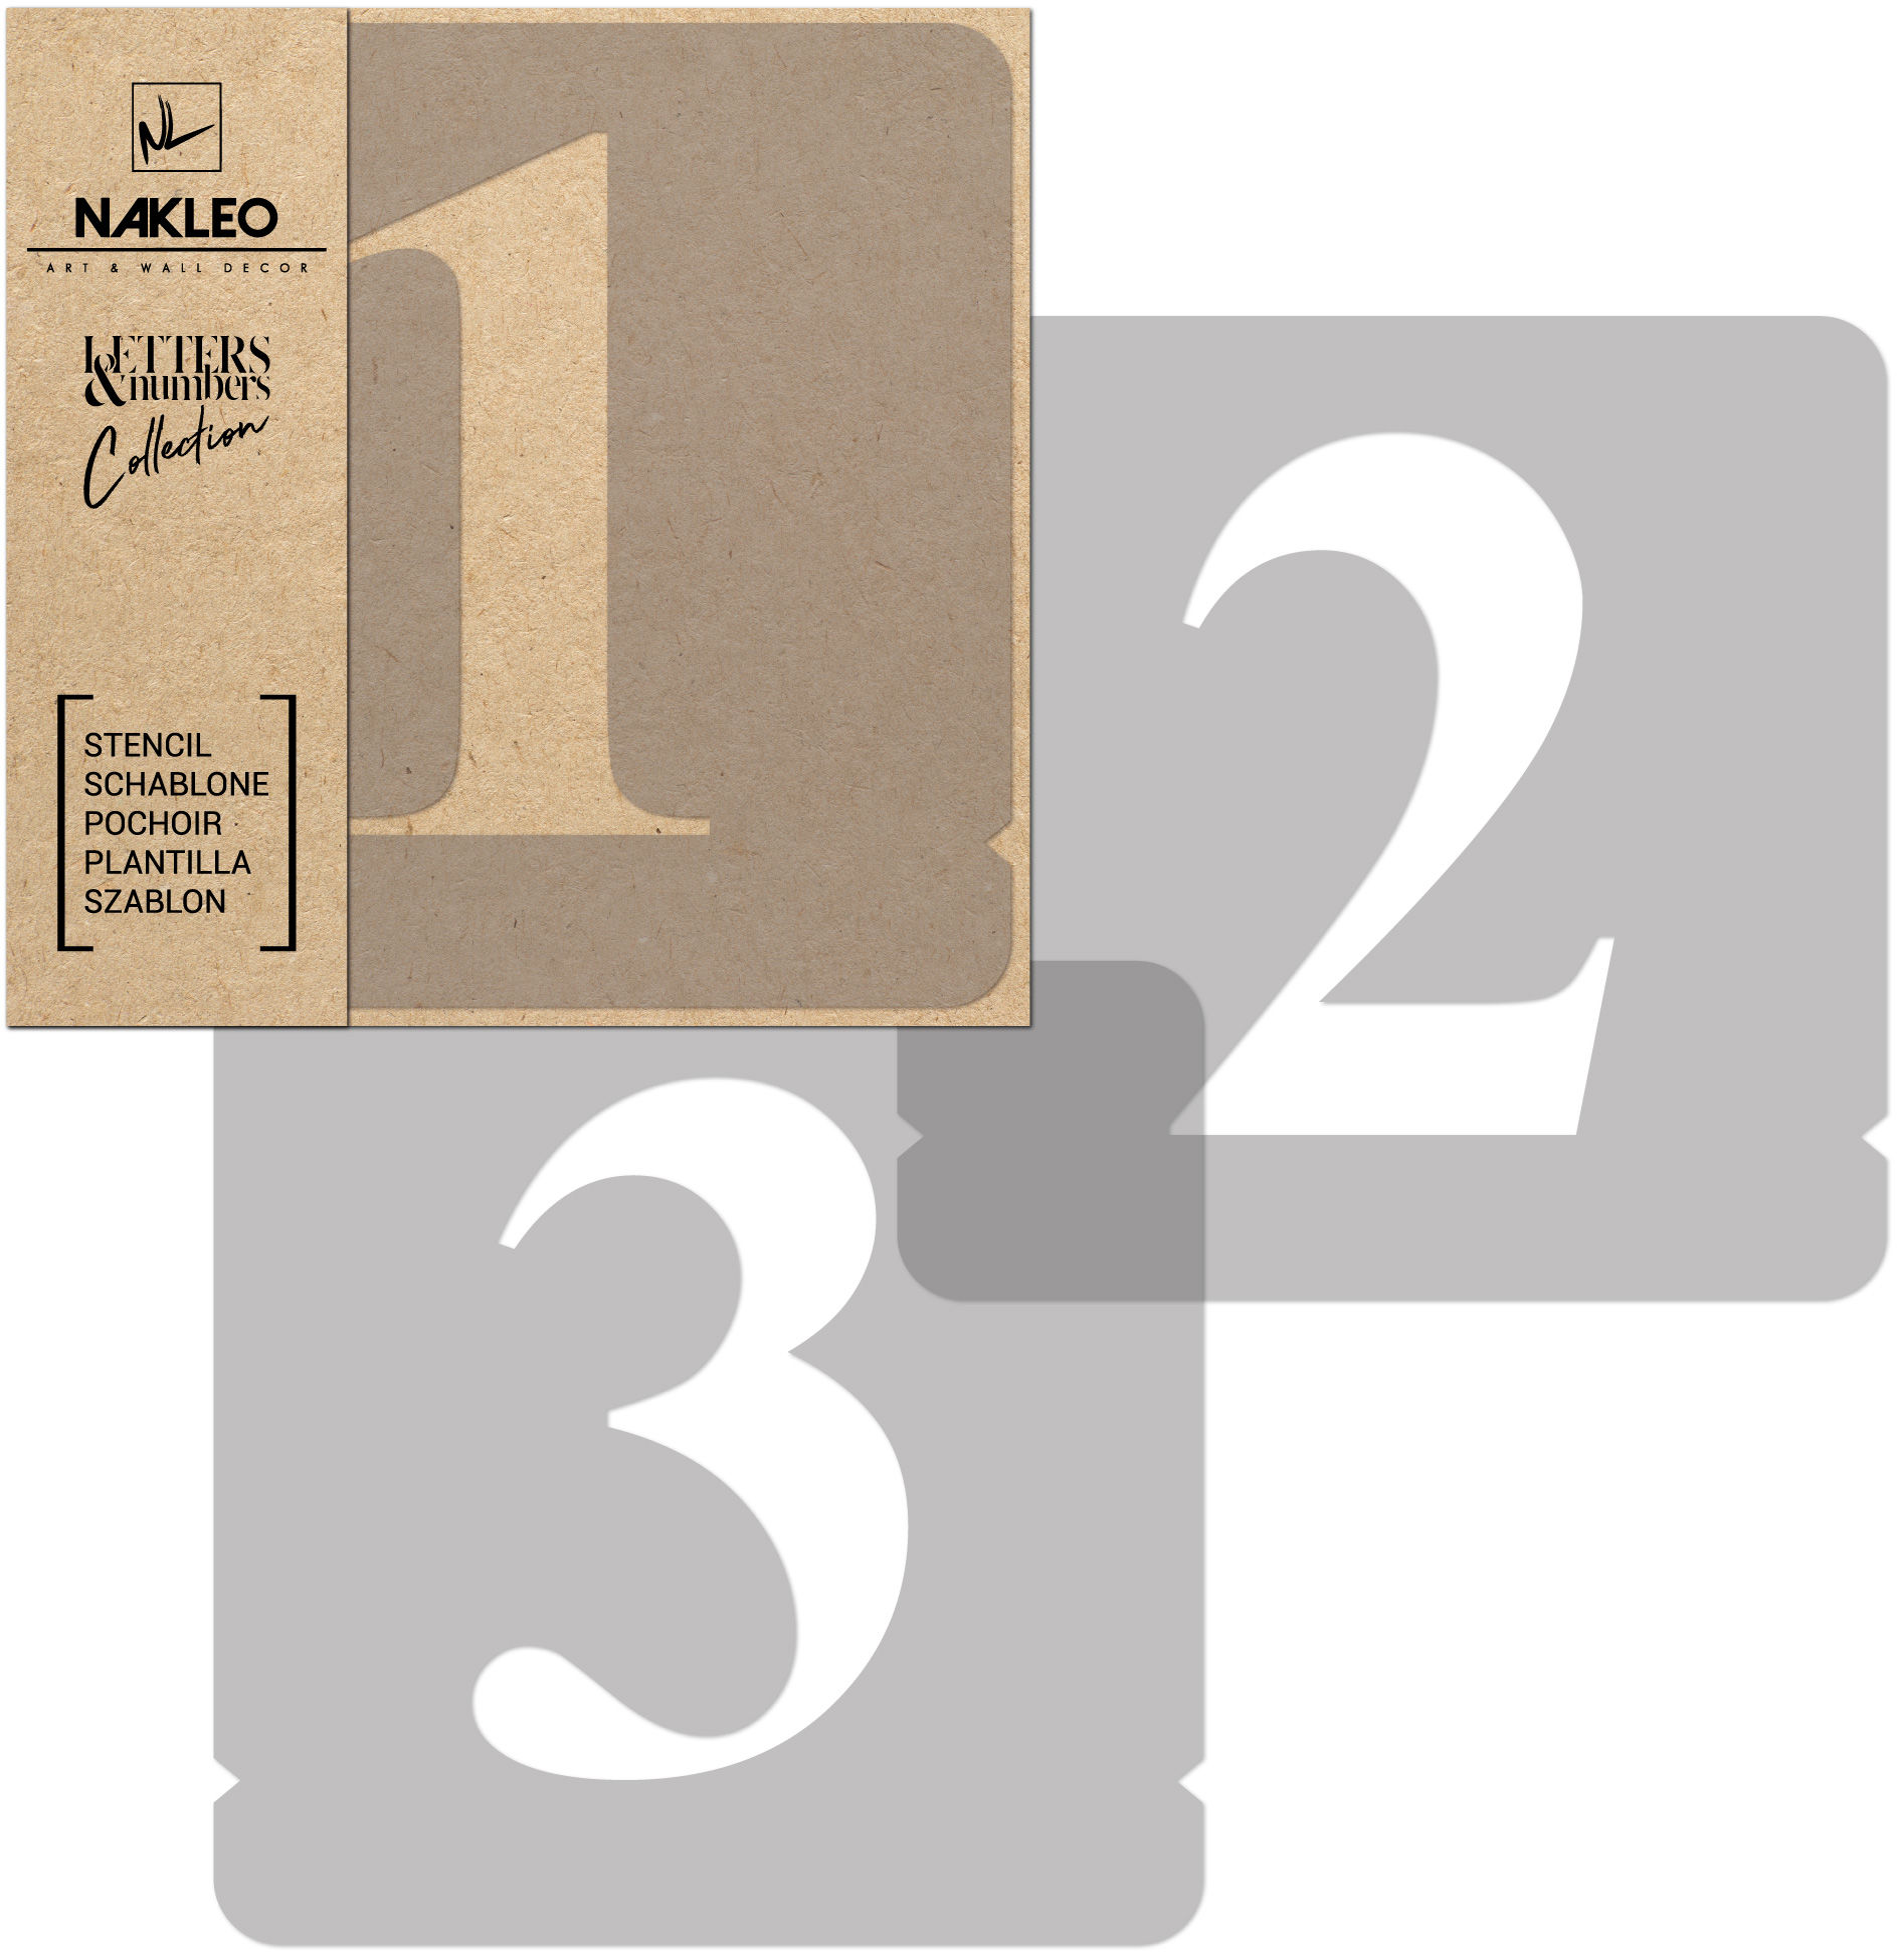 szablon malarski wielokrotny // cyfry 50 mm // Times Roman Cyfry